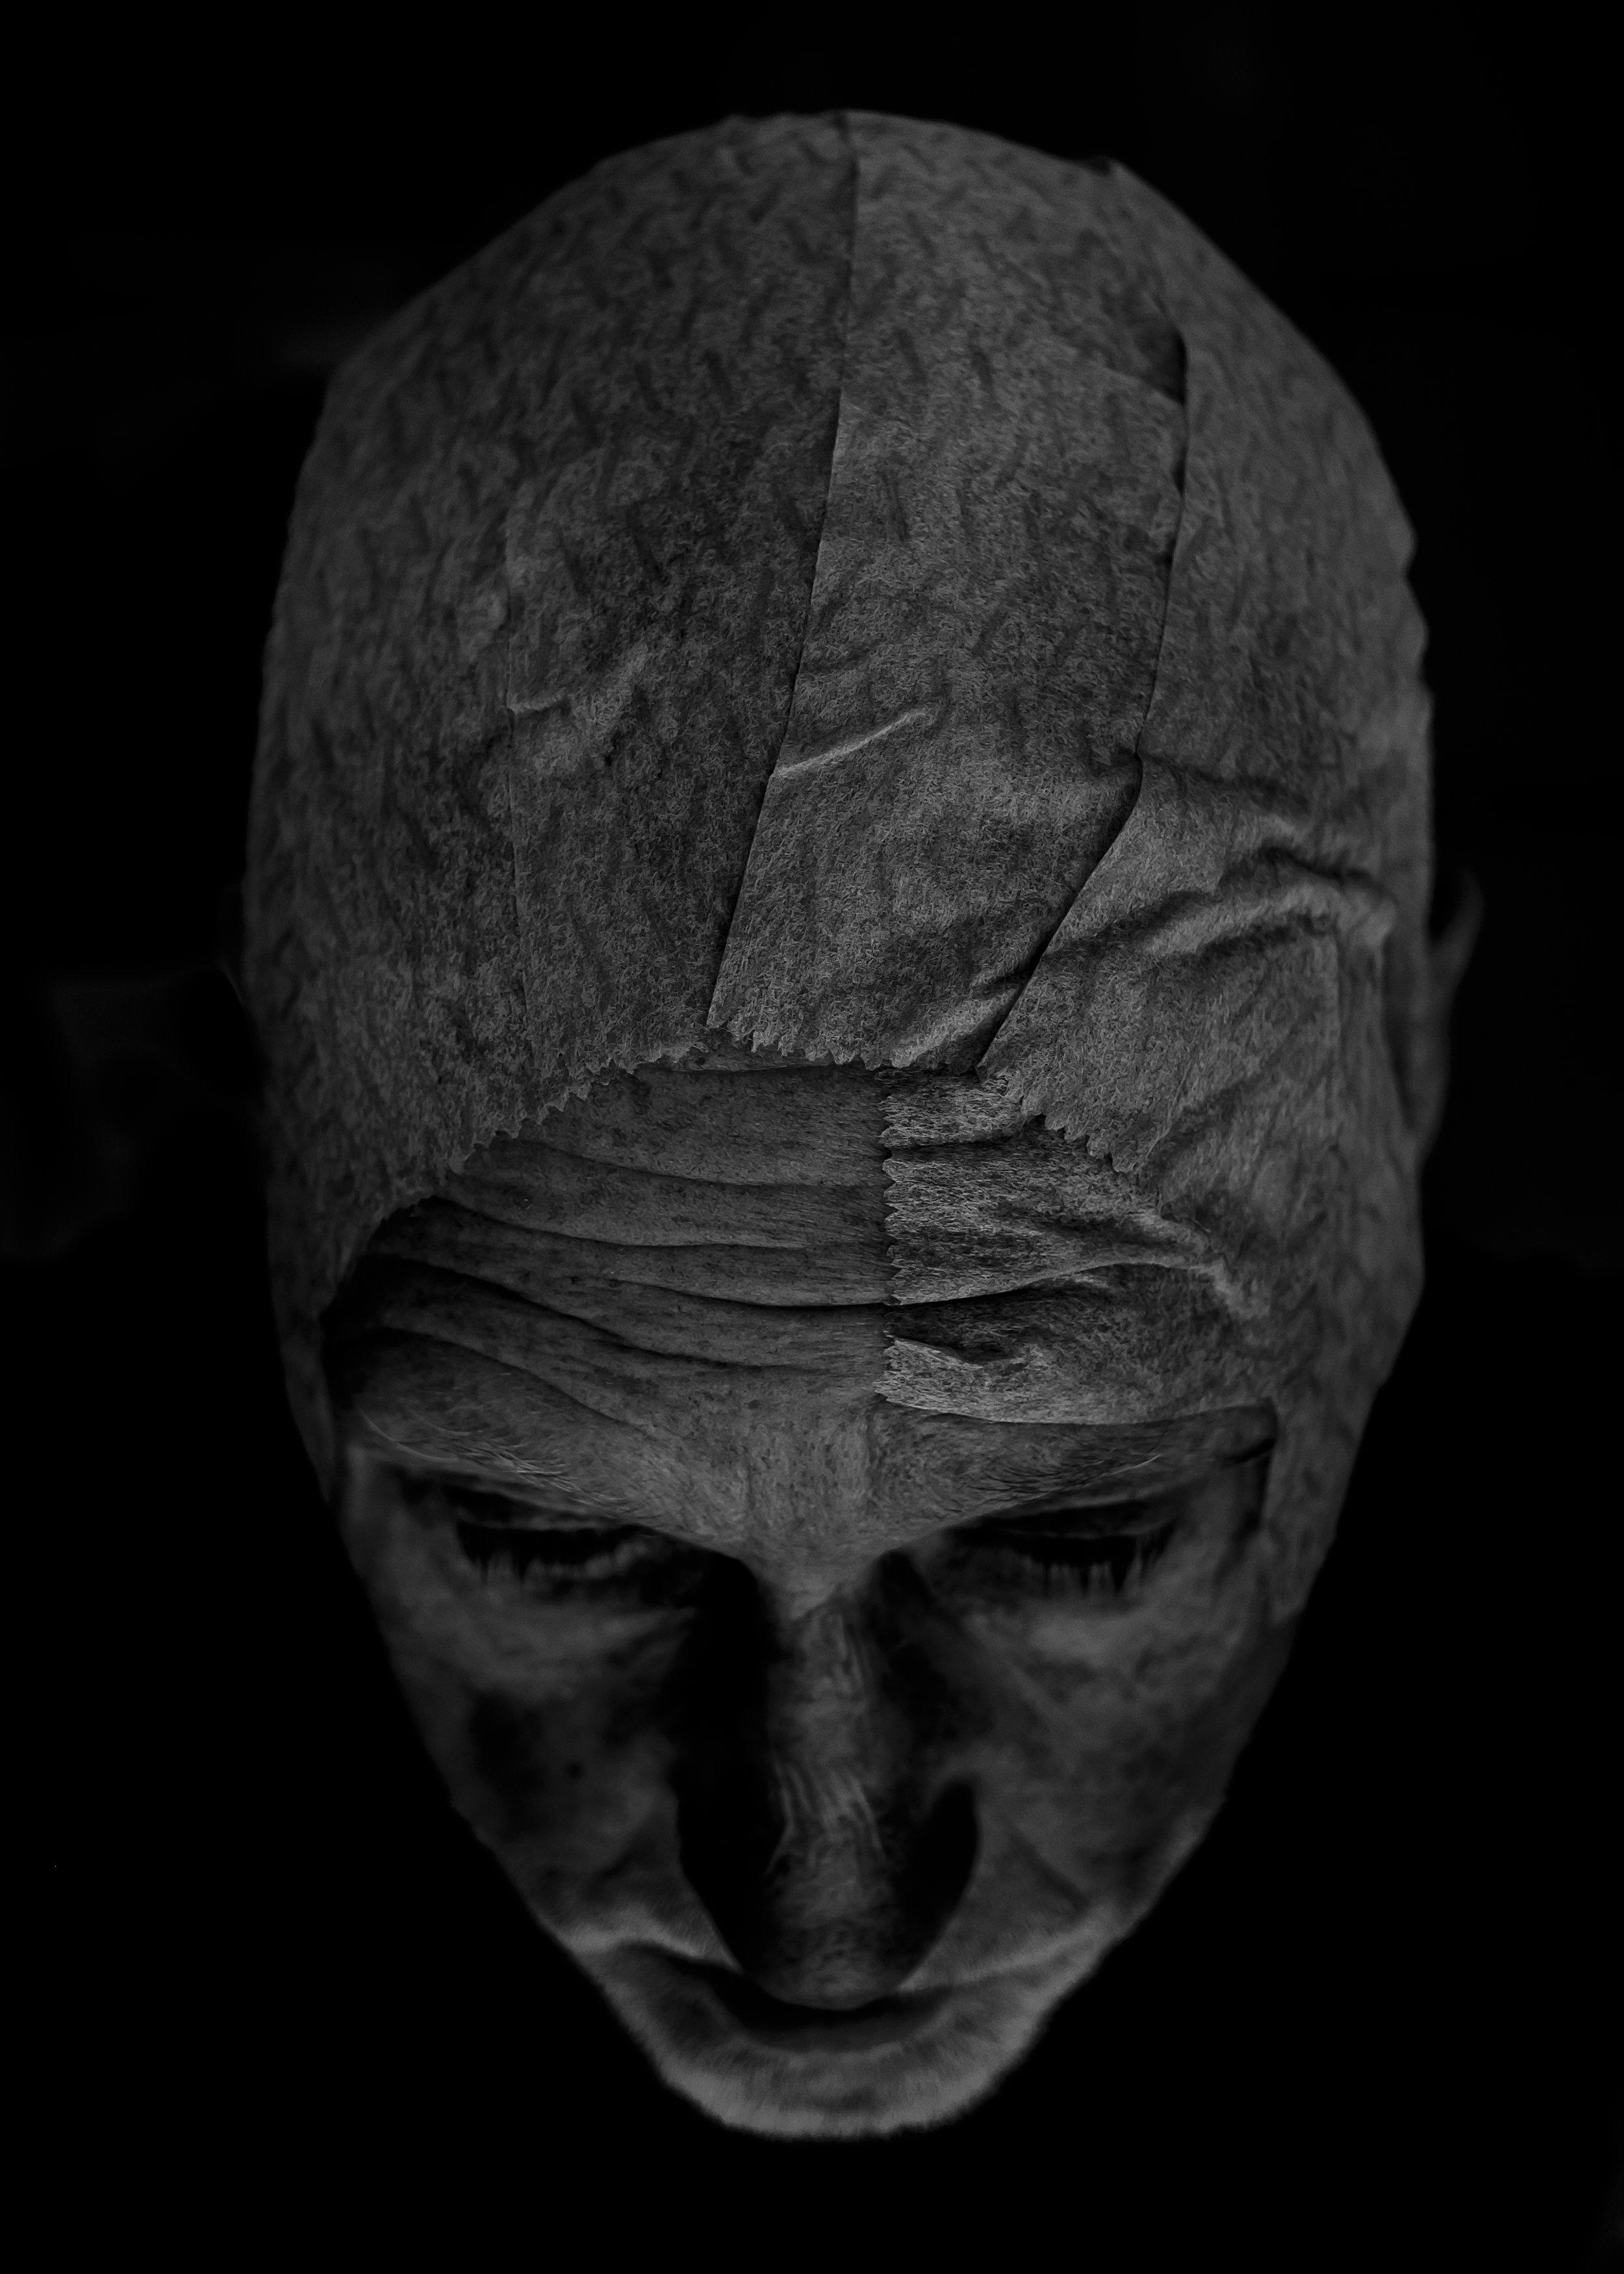 Under the skin © Leif Sandberg